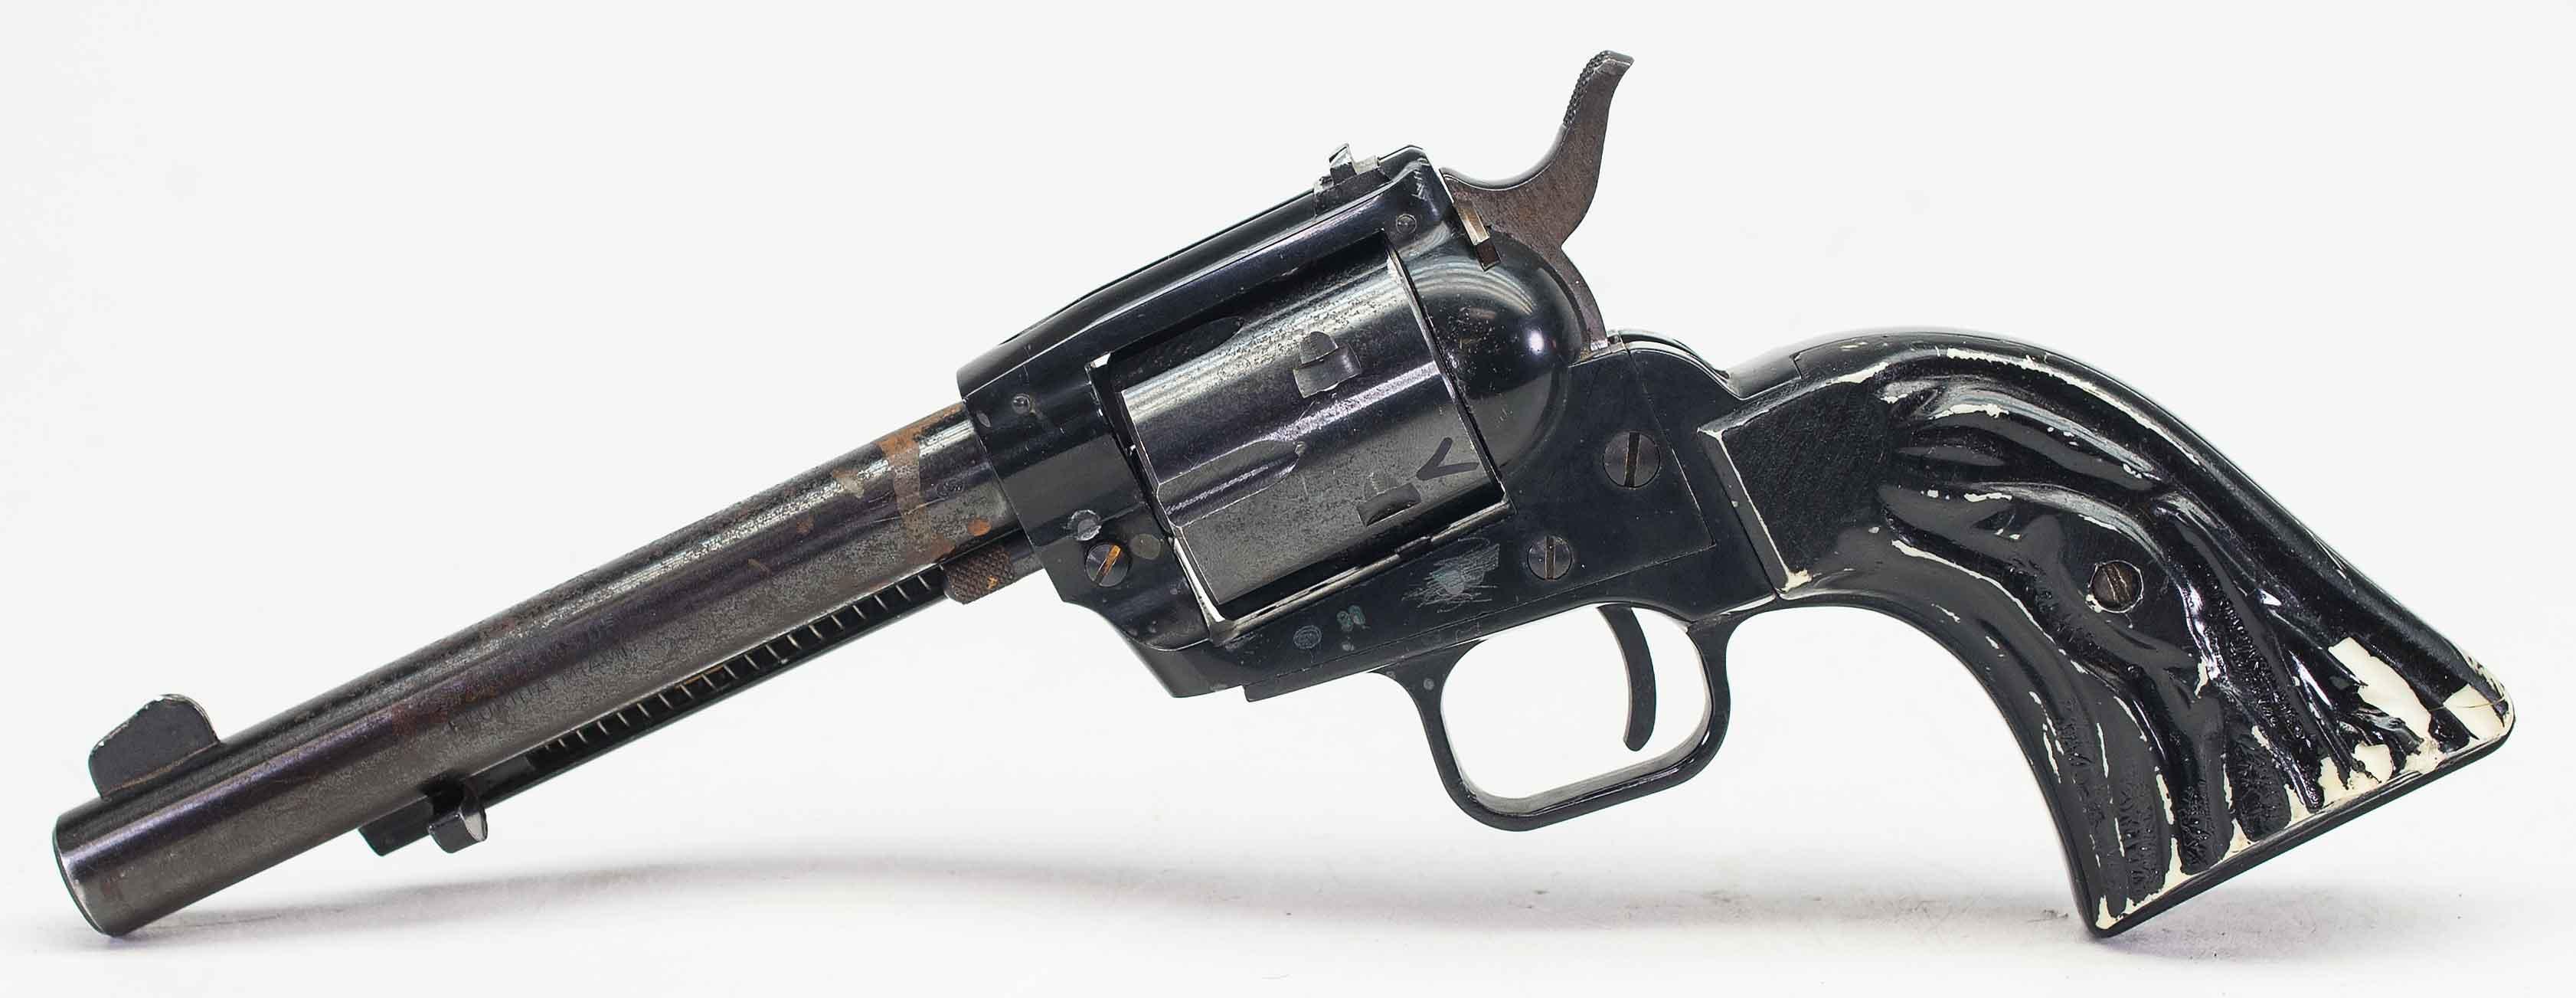 HERBERT SCHMIDT SIERRA SIX MODEL 21S REVOLVER (Auction ID: 10574854